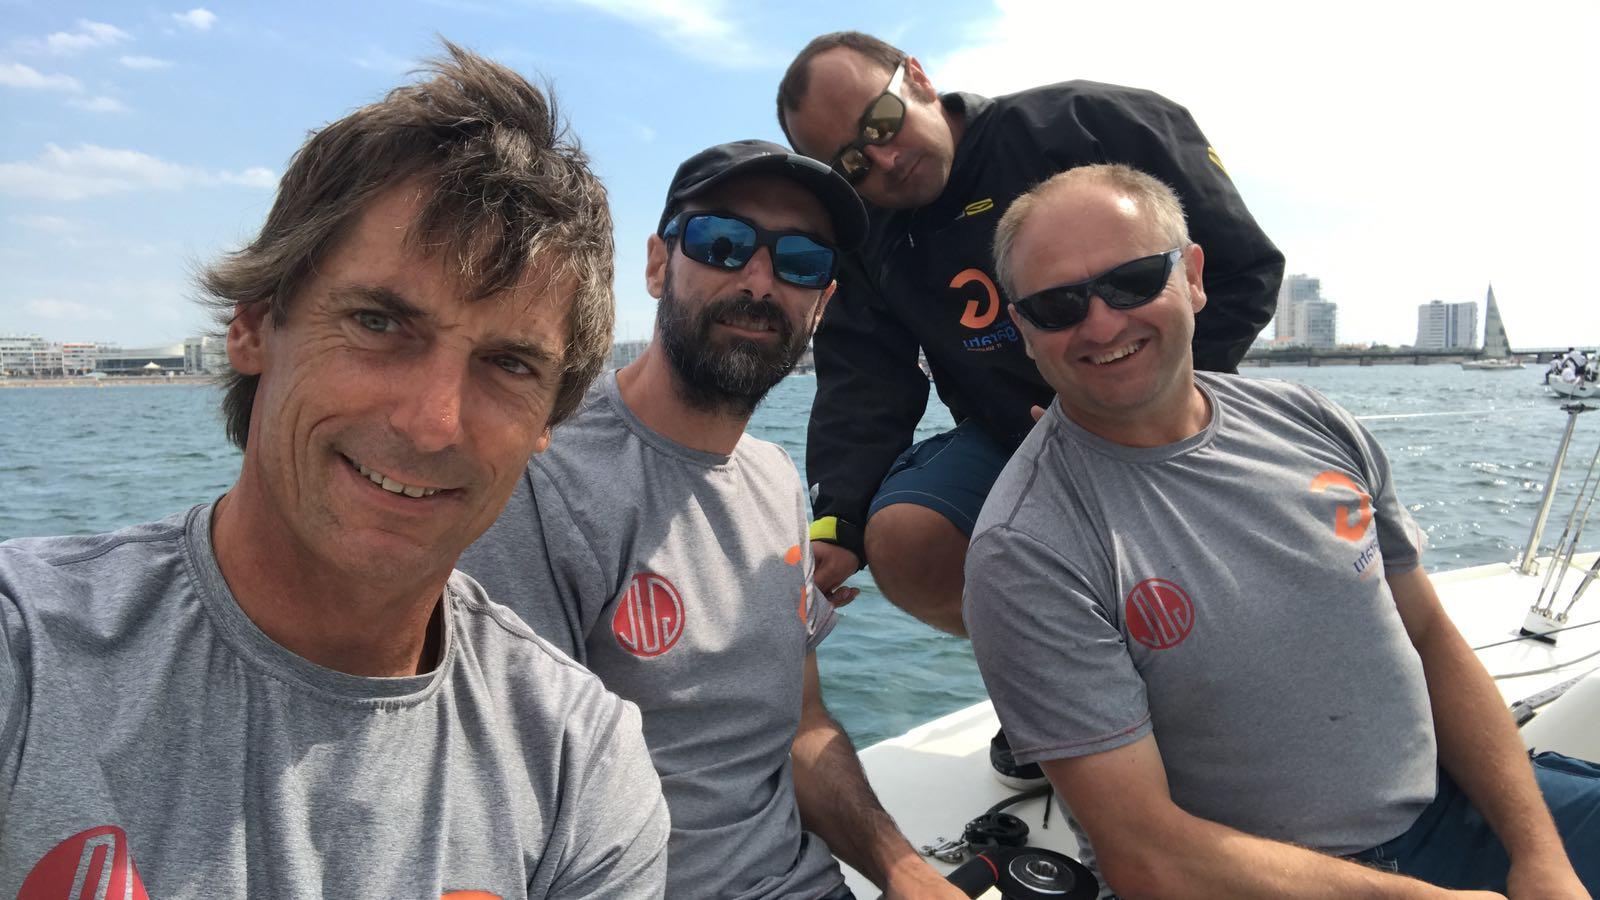 Subcampeones mundial j80 2018 Iker Almandoz, Íñigo Jauregui. Borja Ponte e Íñigo Sánchez